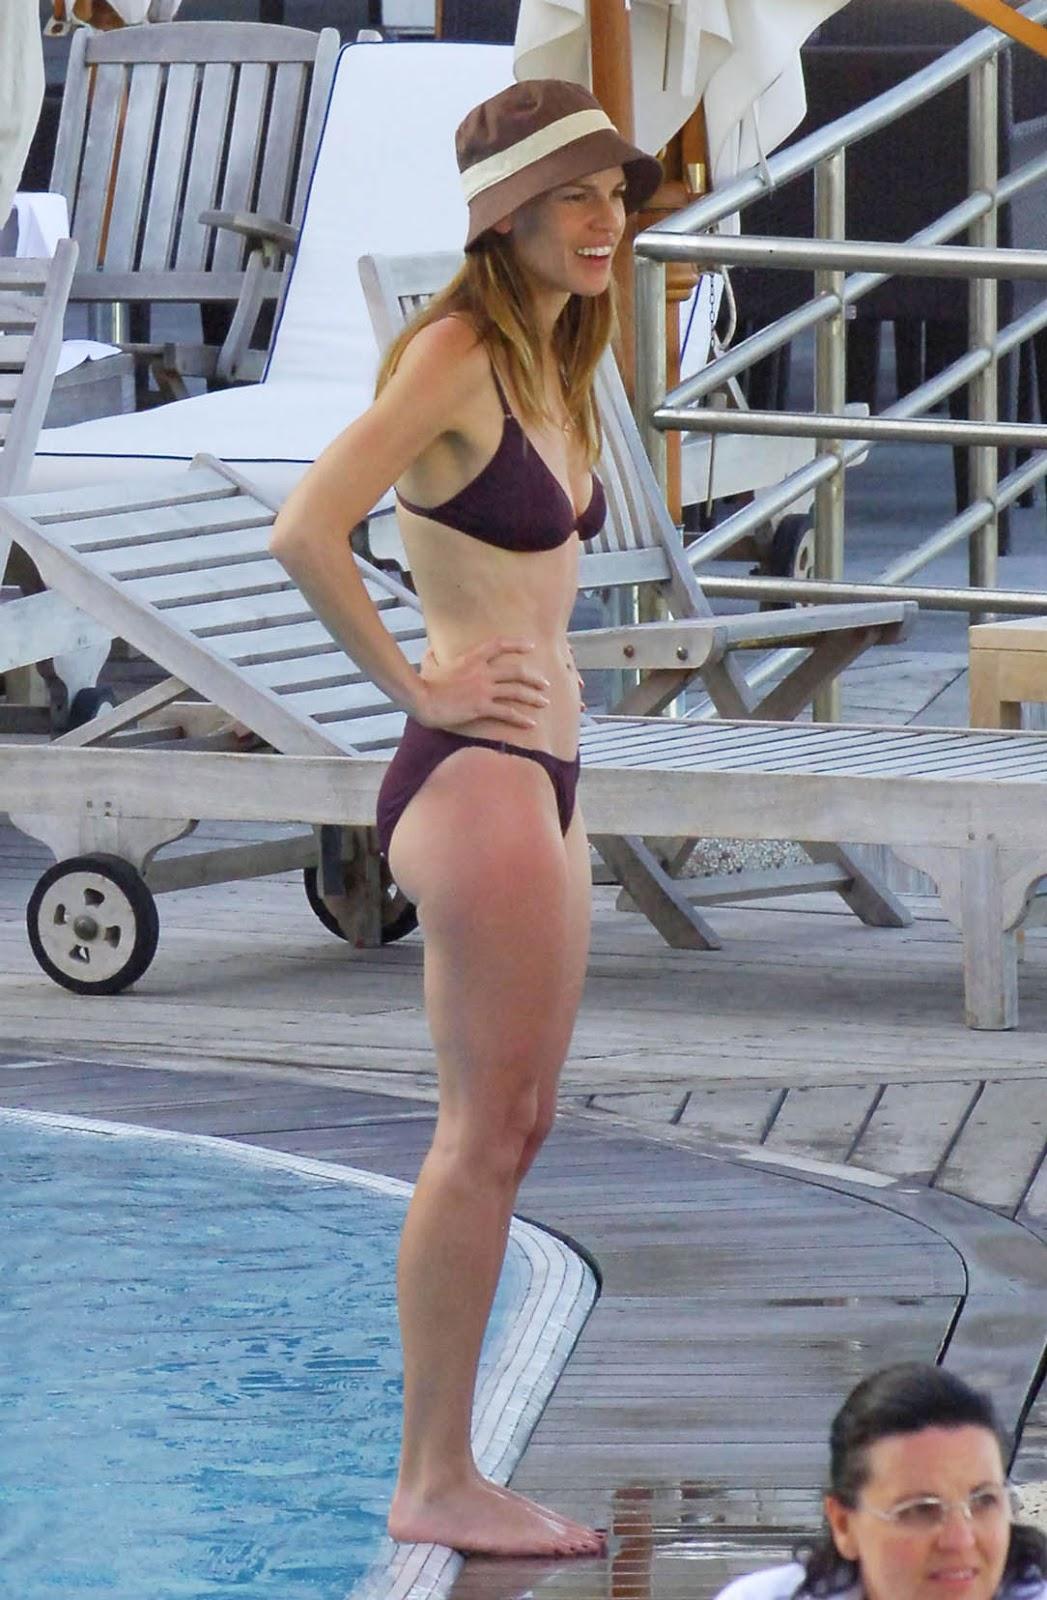 DamnTopics: Hilary Swank hot Bikini Pictures,photos: damn-topics.blogspot.com/2012/05/hilary-swank-hot-bikini...